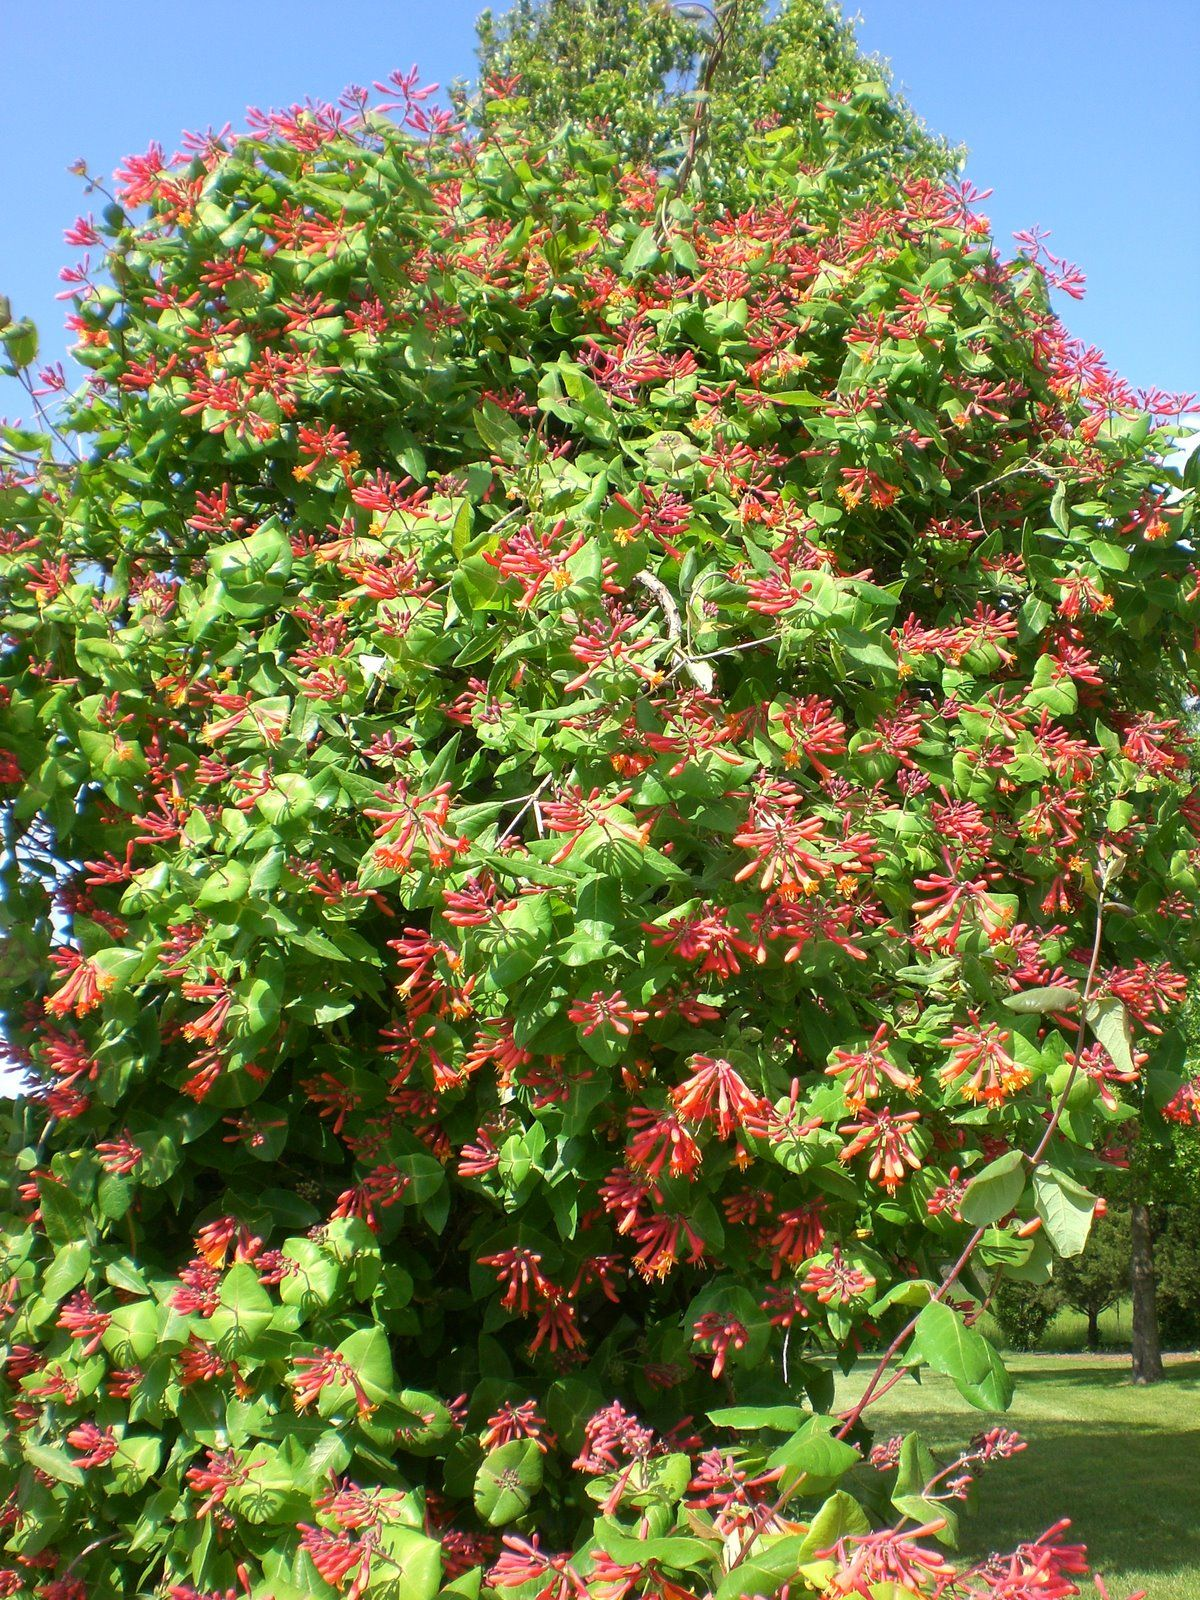 Honeysuckle Vine Arbor at entrance to gardens. 11237 N. McDonald Rd.  Centralia, Mo.